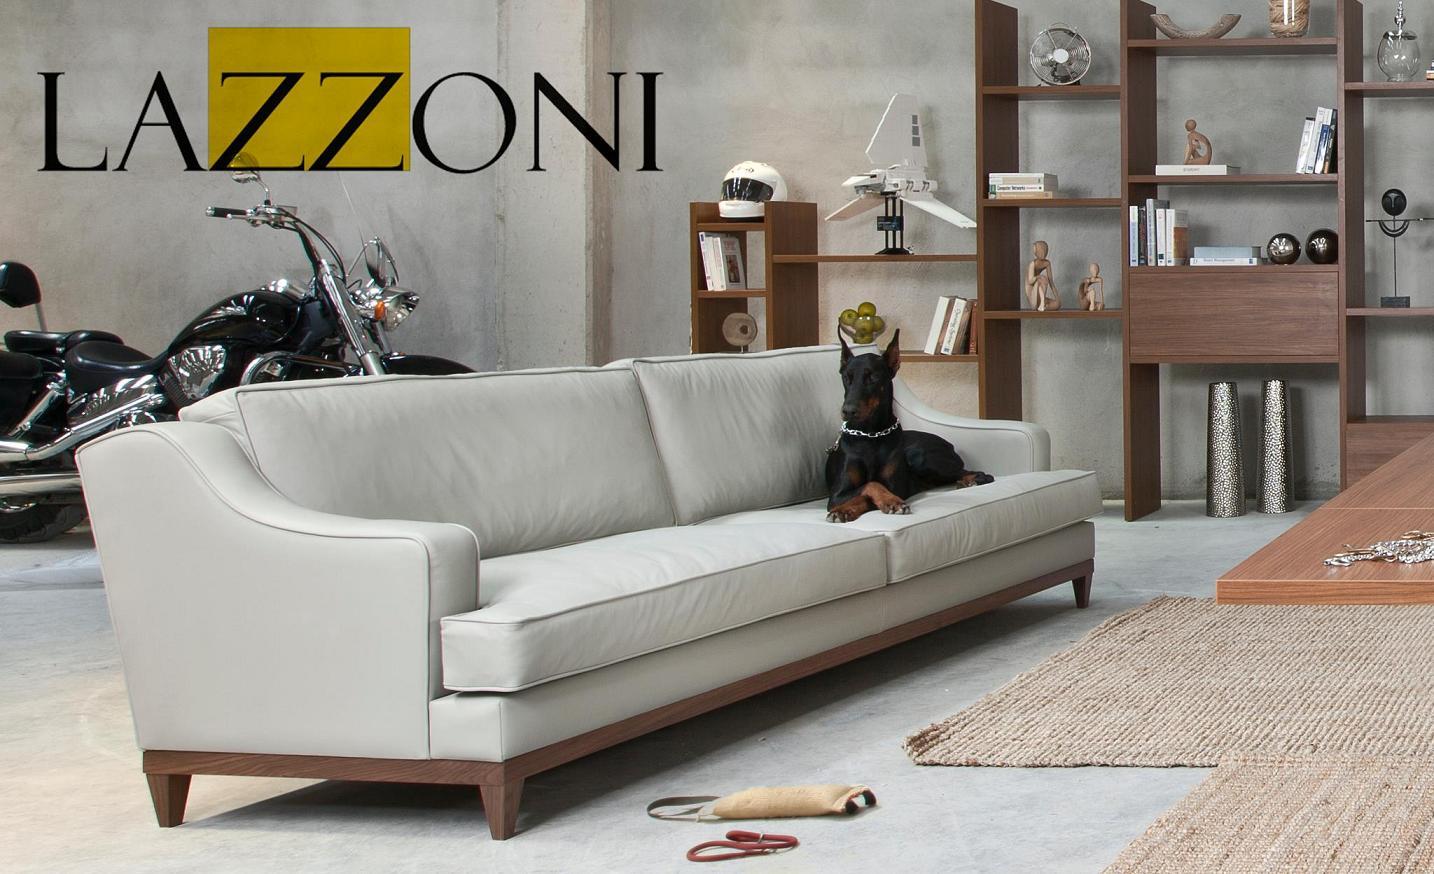 Lazzoni Mobilya Katalog Cekimleri Bagira Secereli